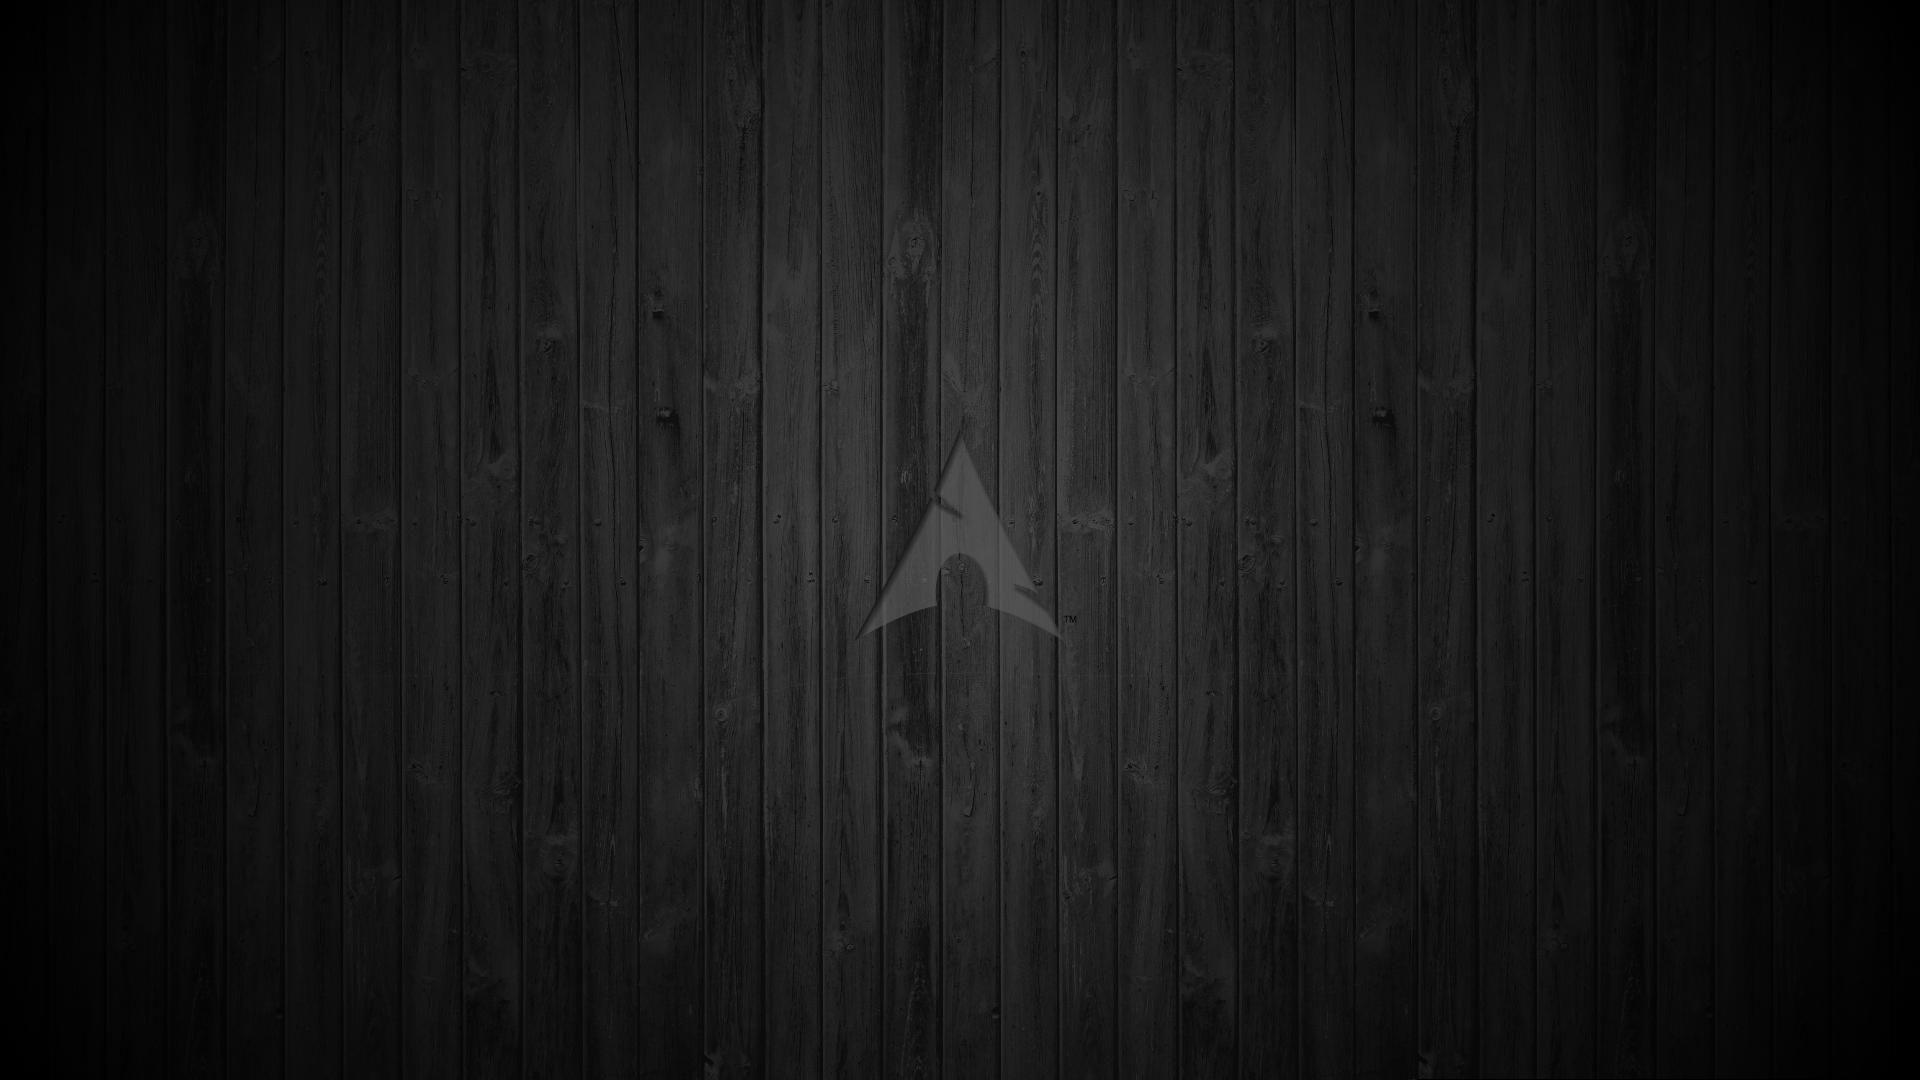 Arch free